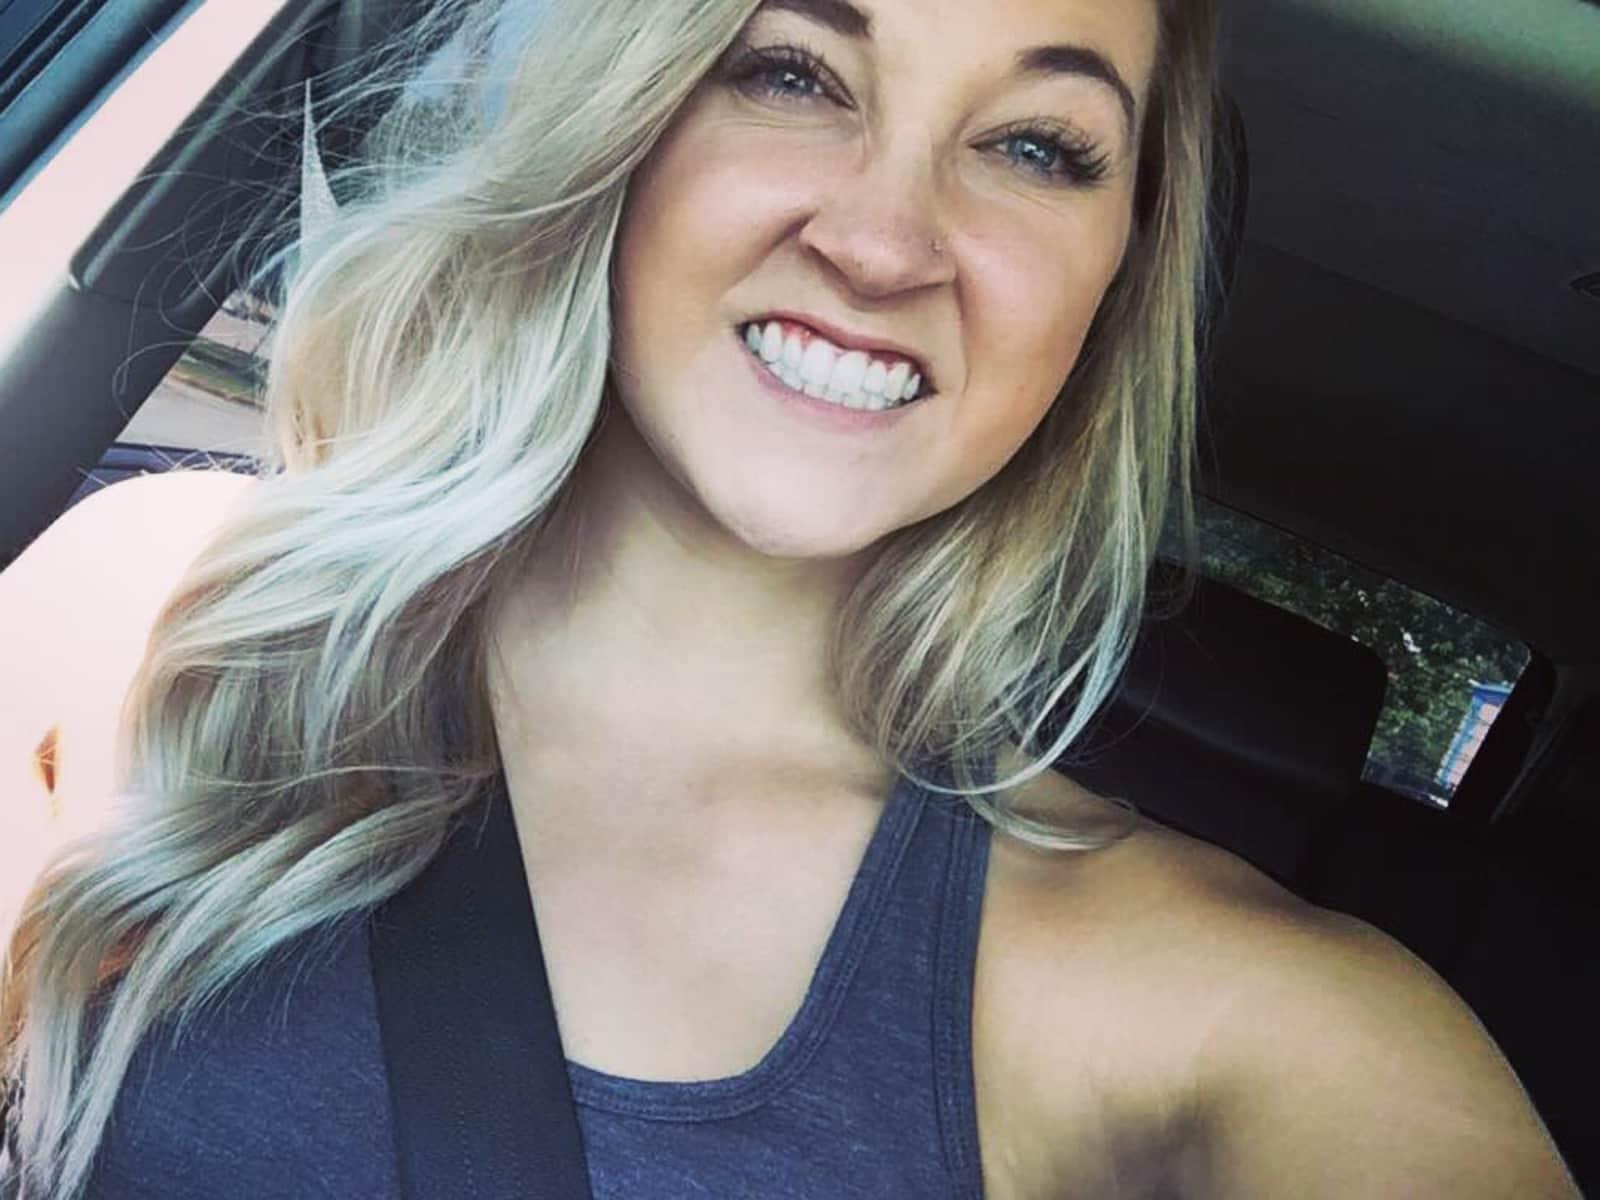 Amanda from Castle Rock, Colorado, United States